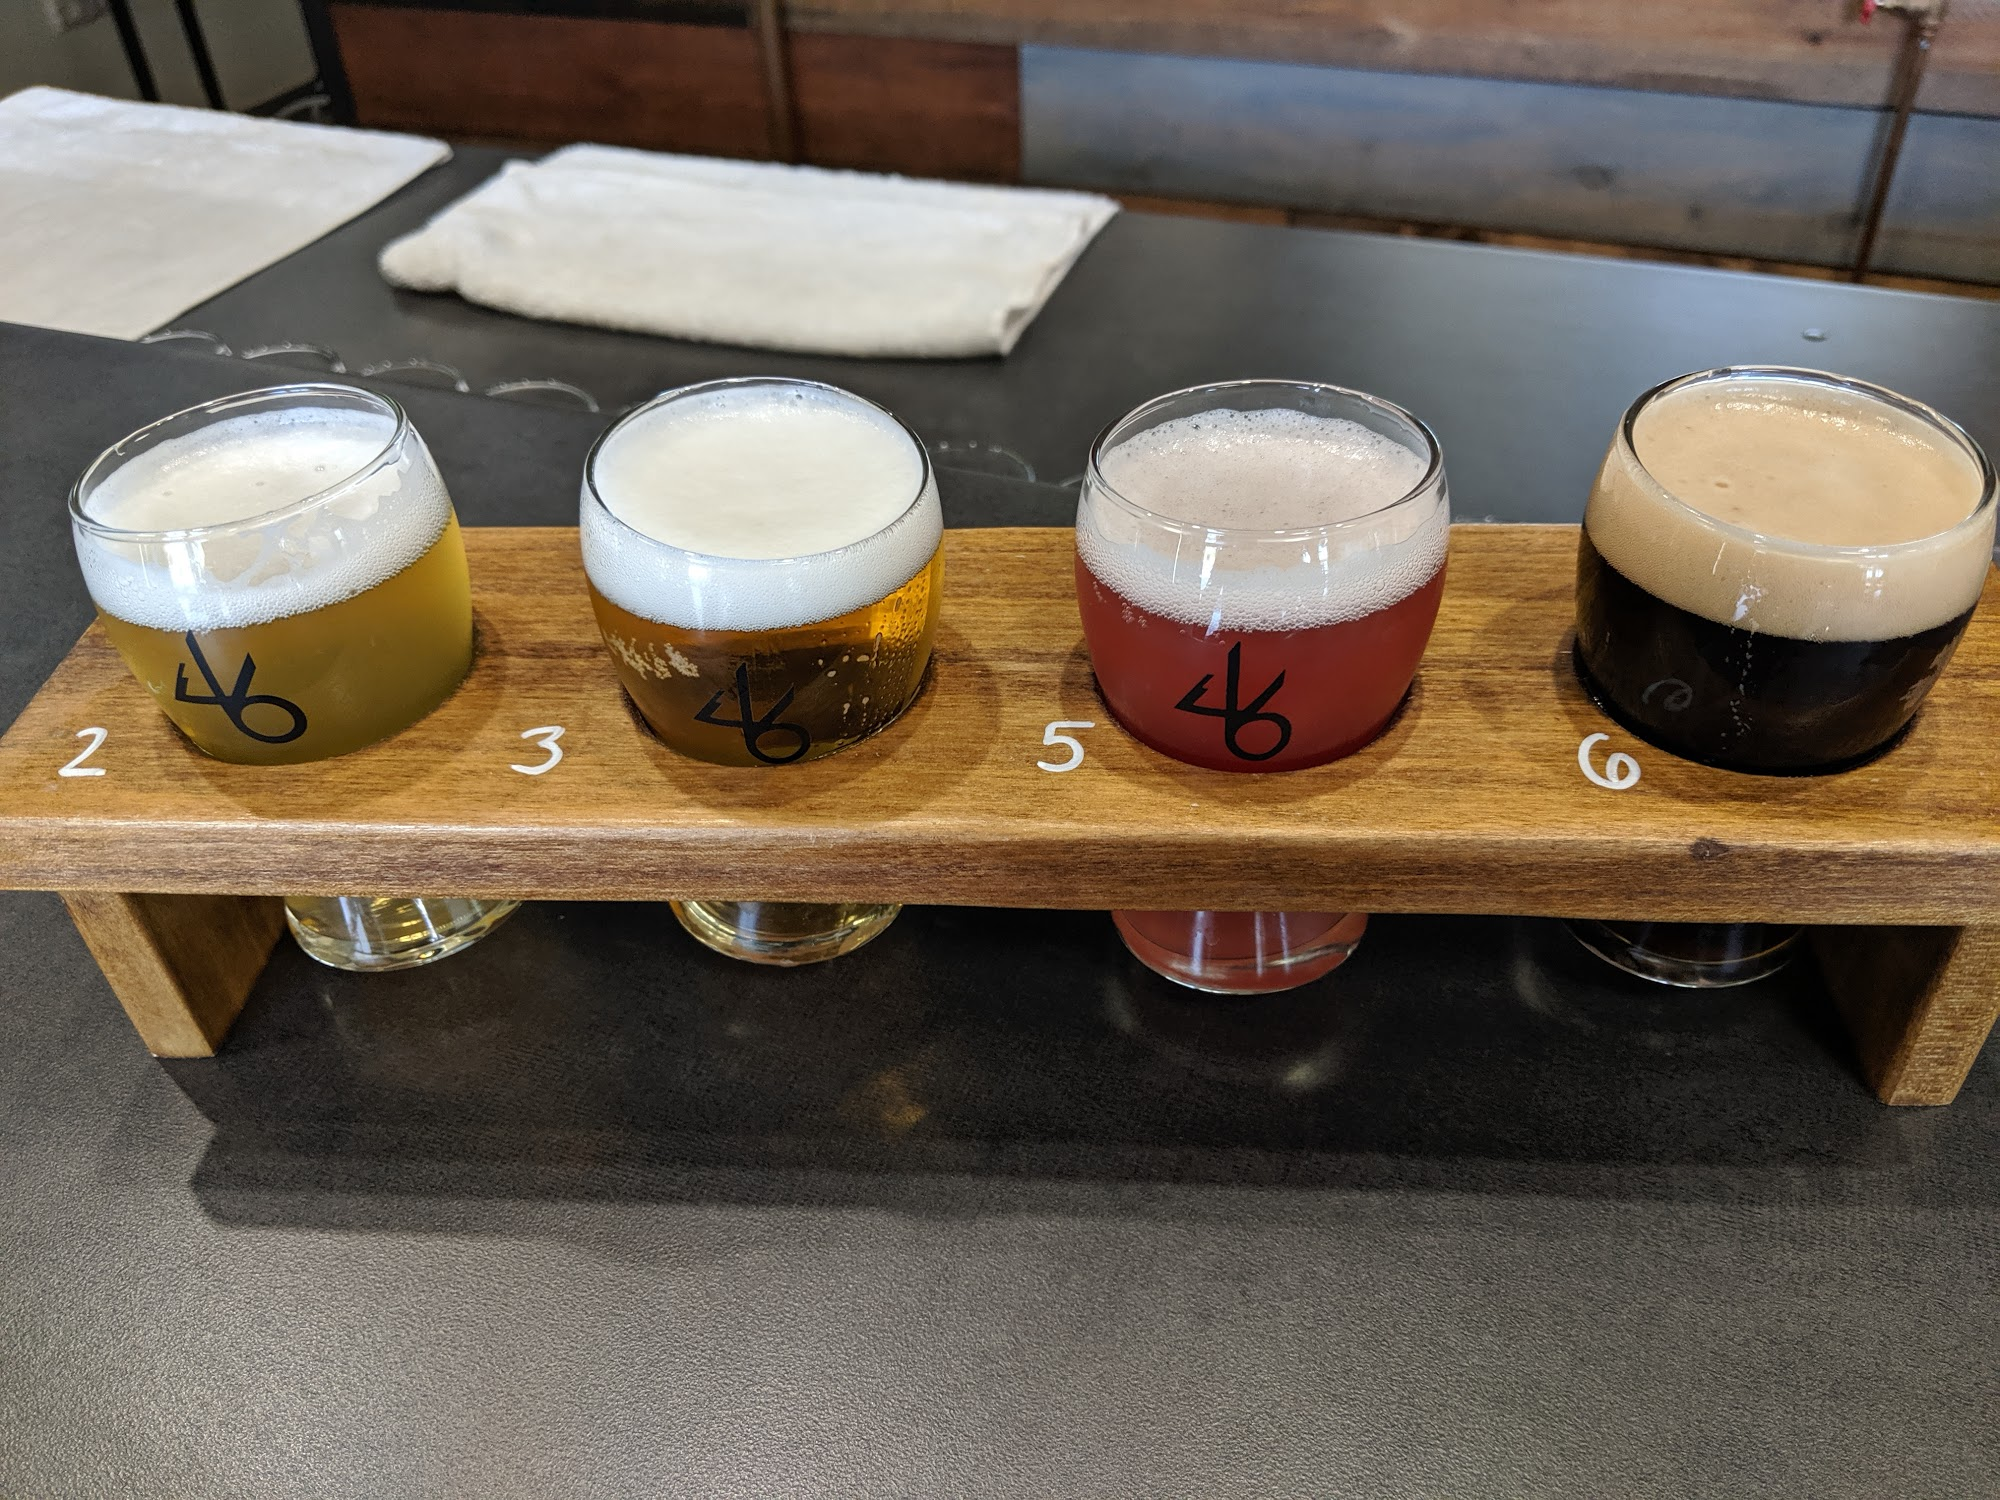 46 North Brewing Corp. 1275 Kelly Lake Rd #1, Greater Sudbury